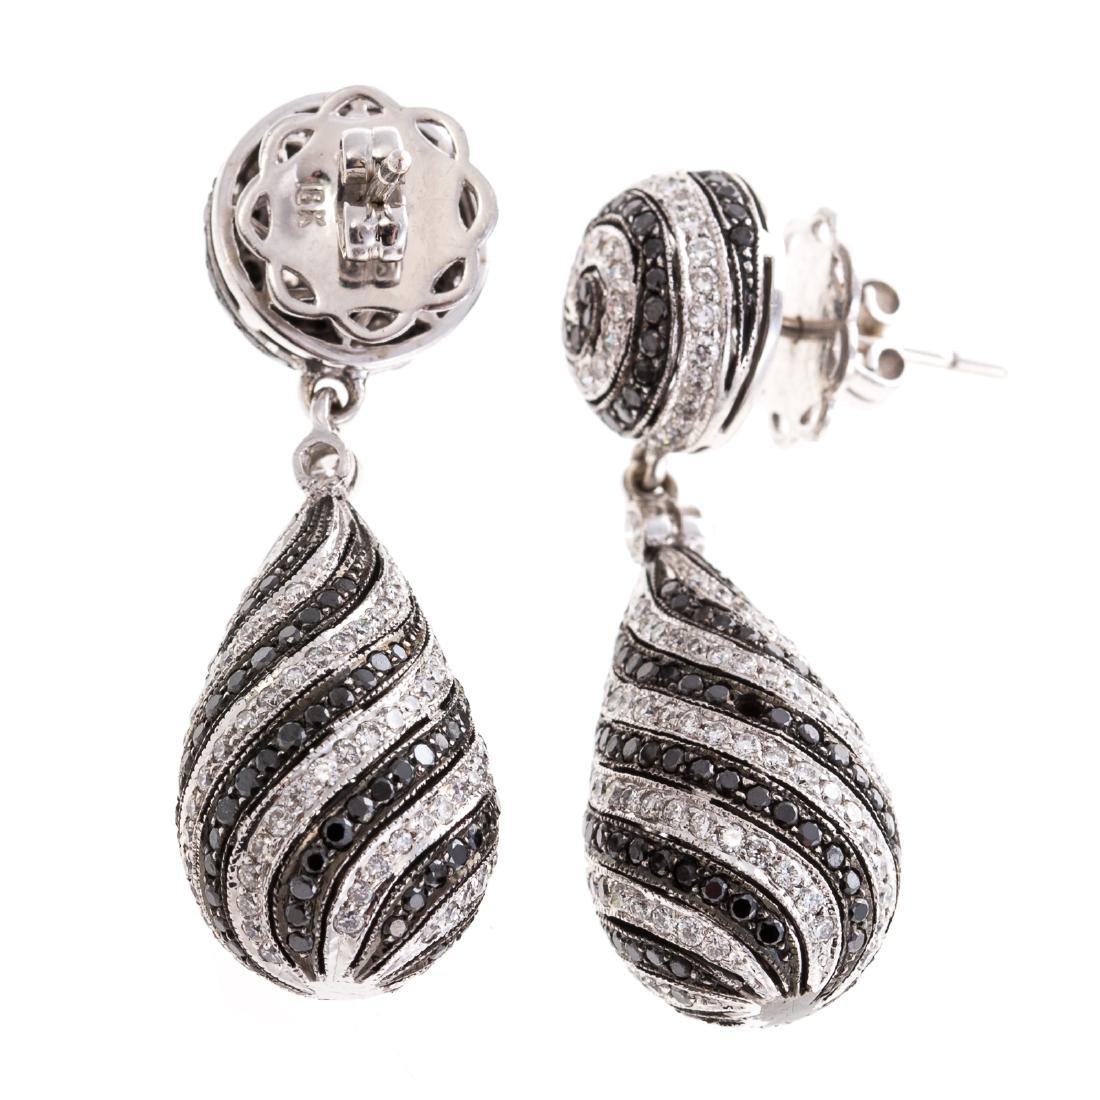 A Pair of Spiral Black & White Diamond Earrings - 2